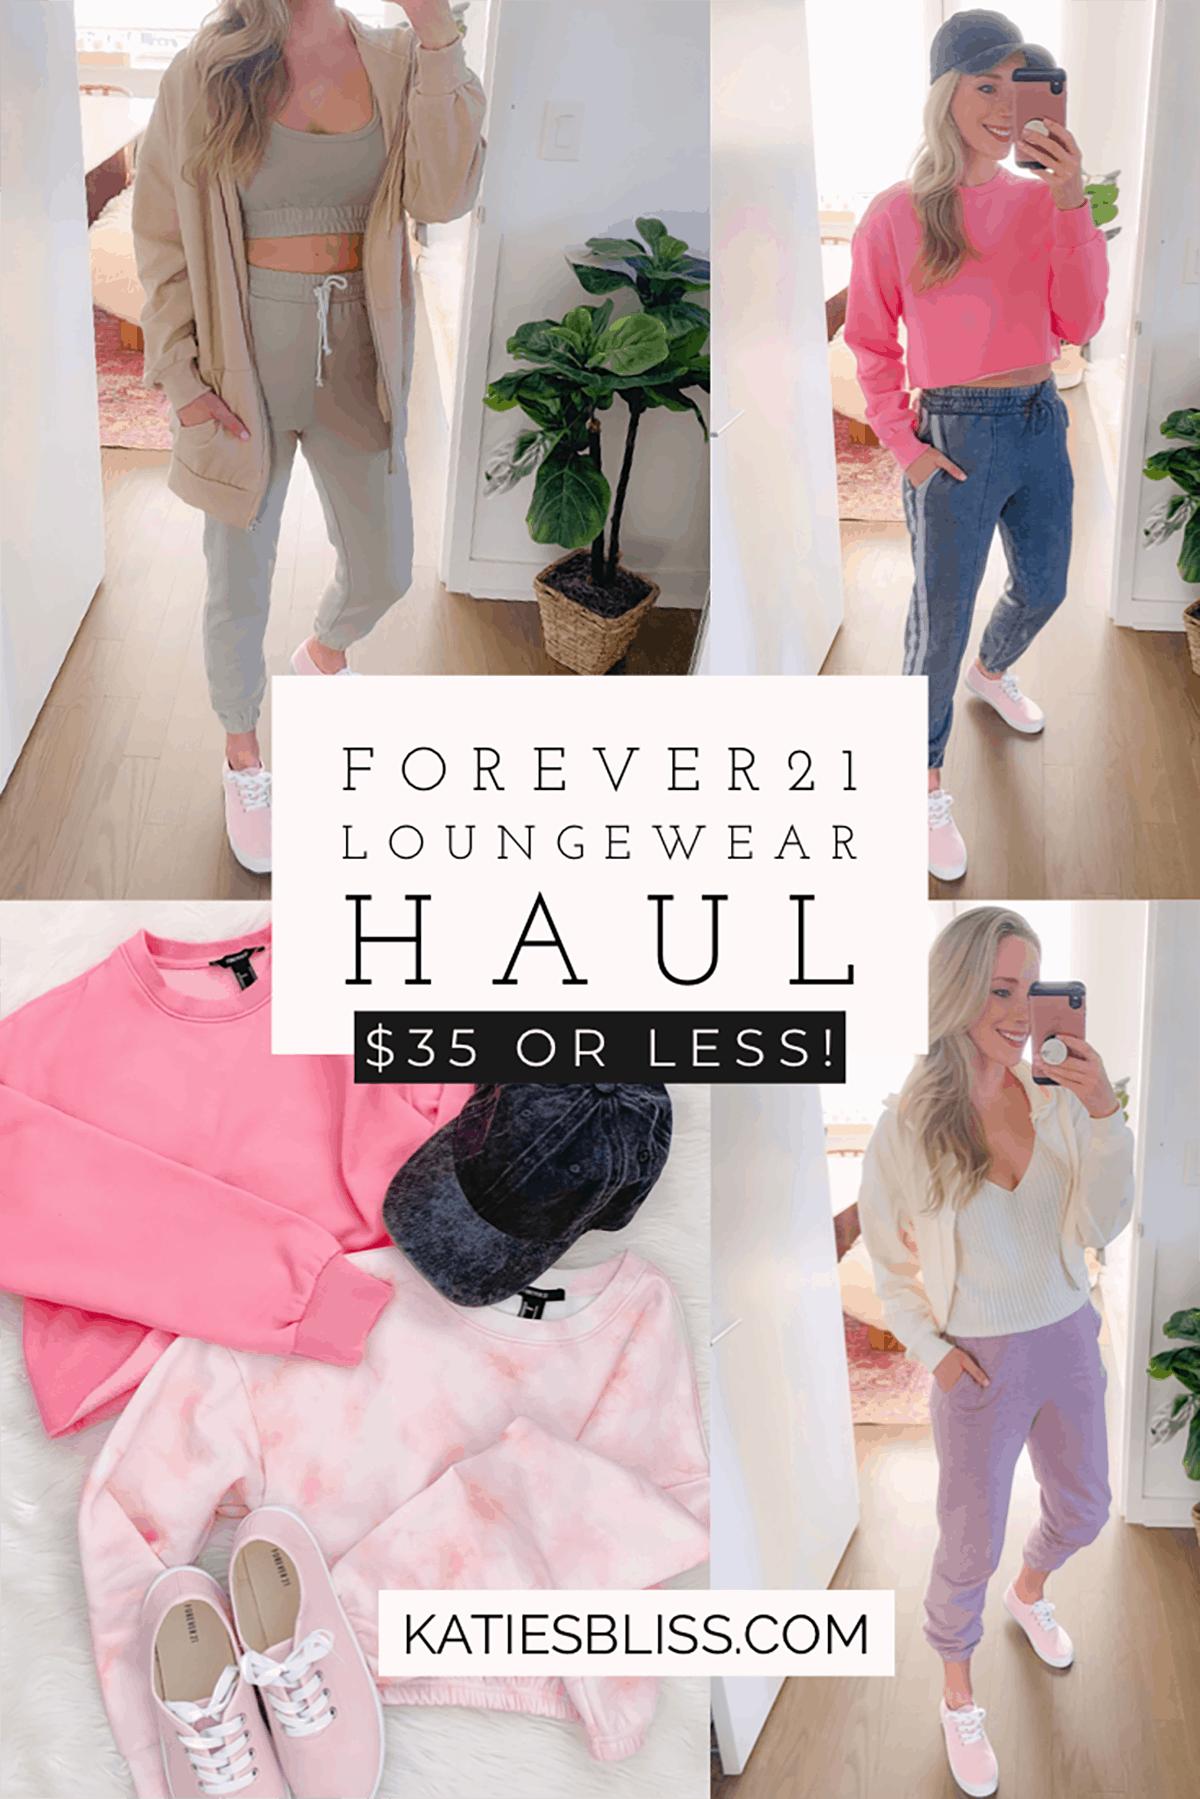 Forever21 Loungewear Haul